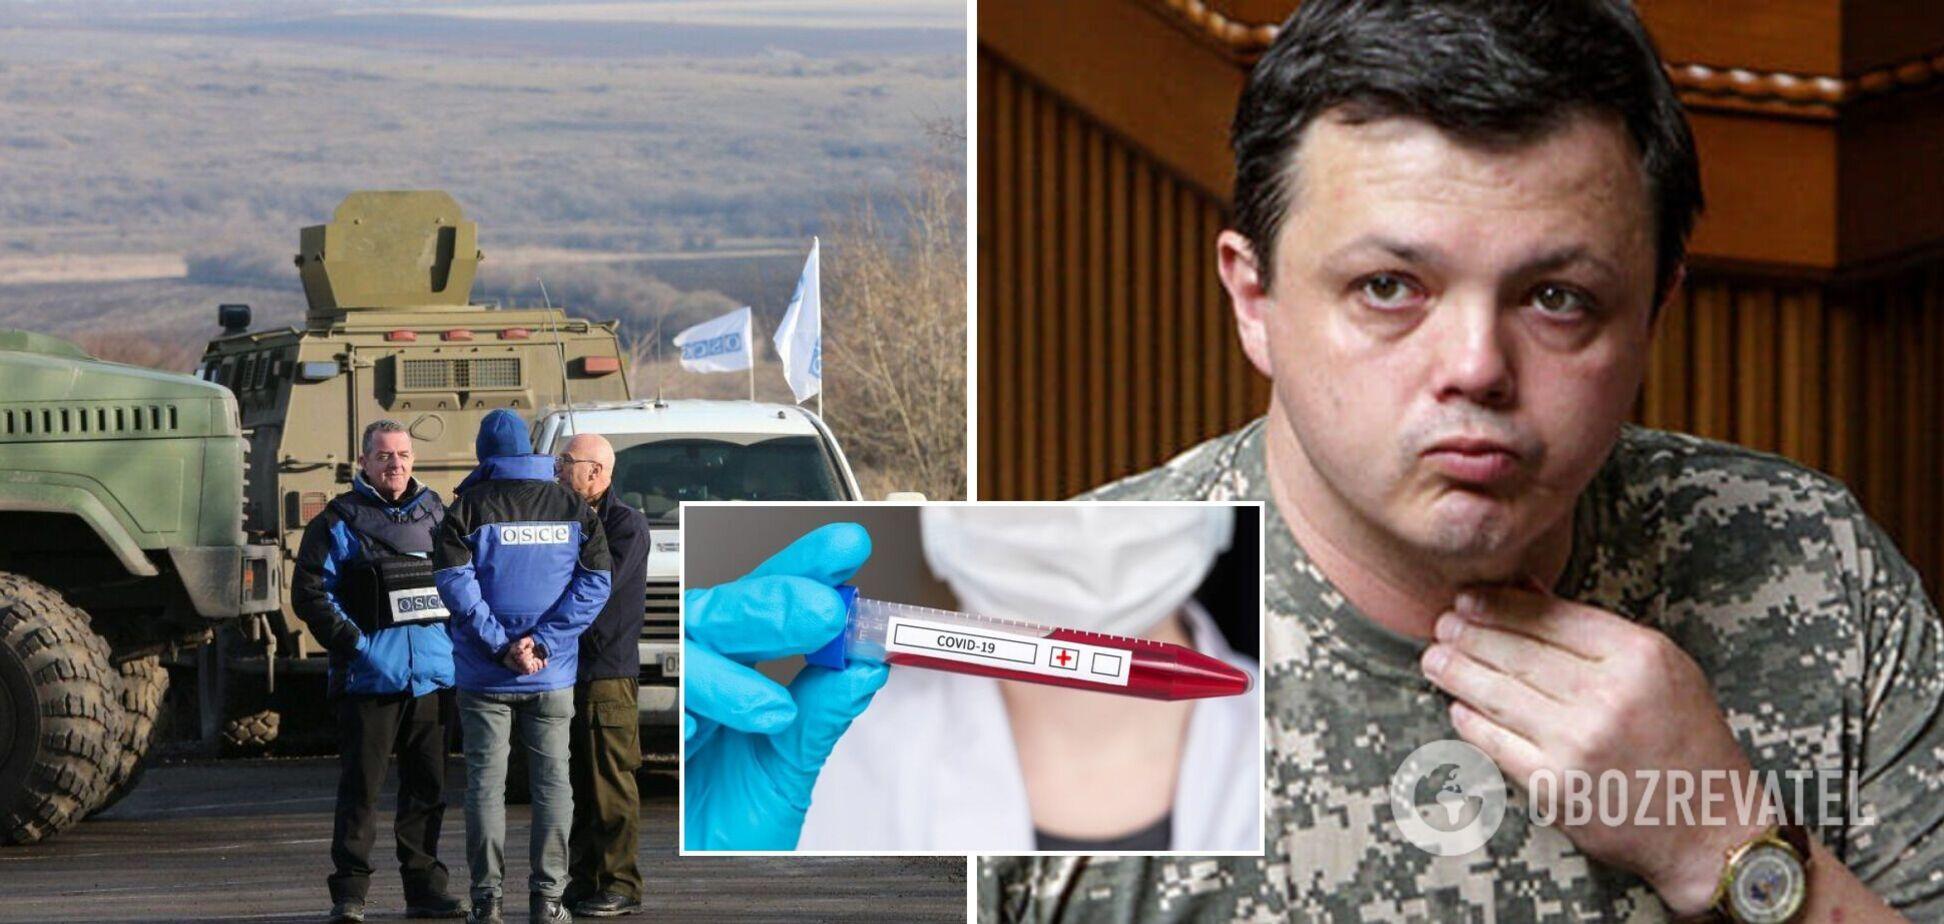 Новини України: Семенченка заарештували, а Степанов попередив про новий пік COVID-19